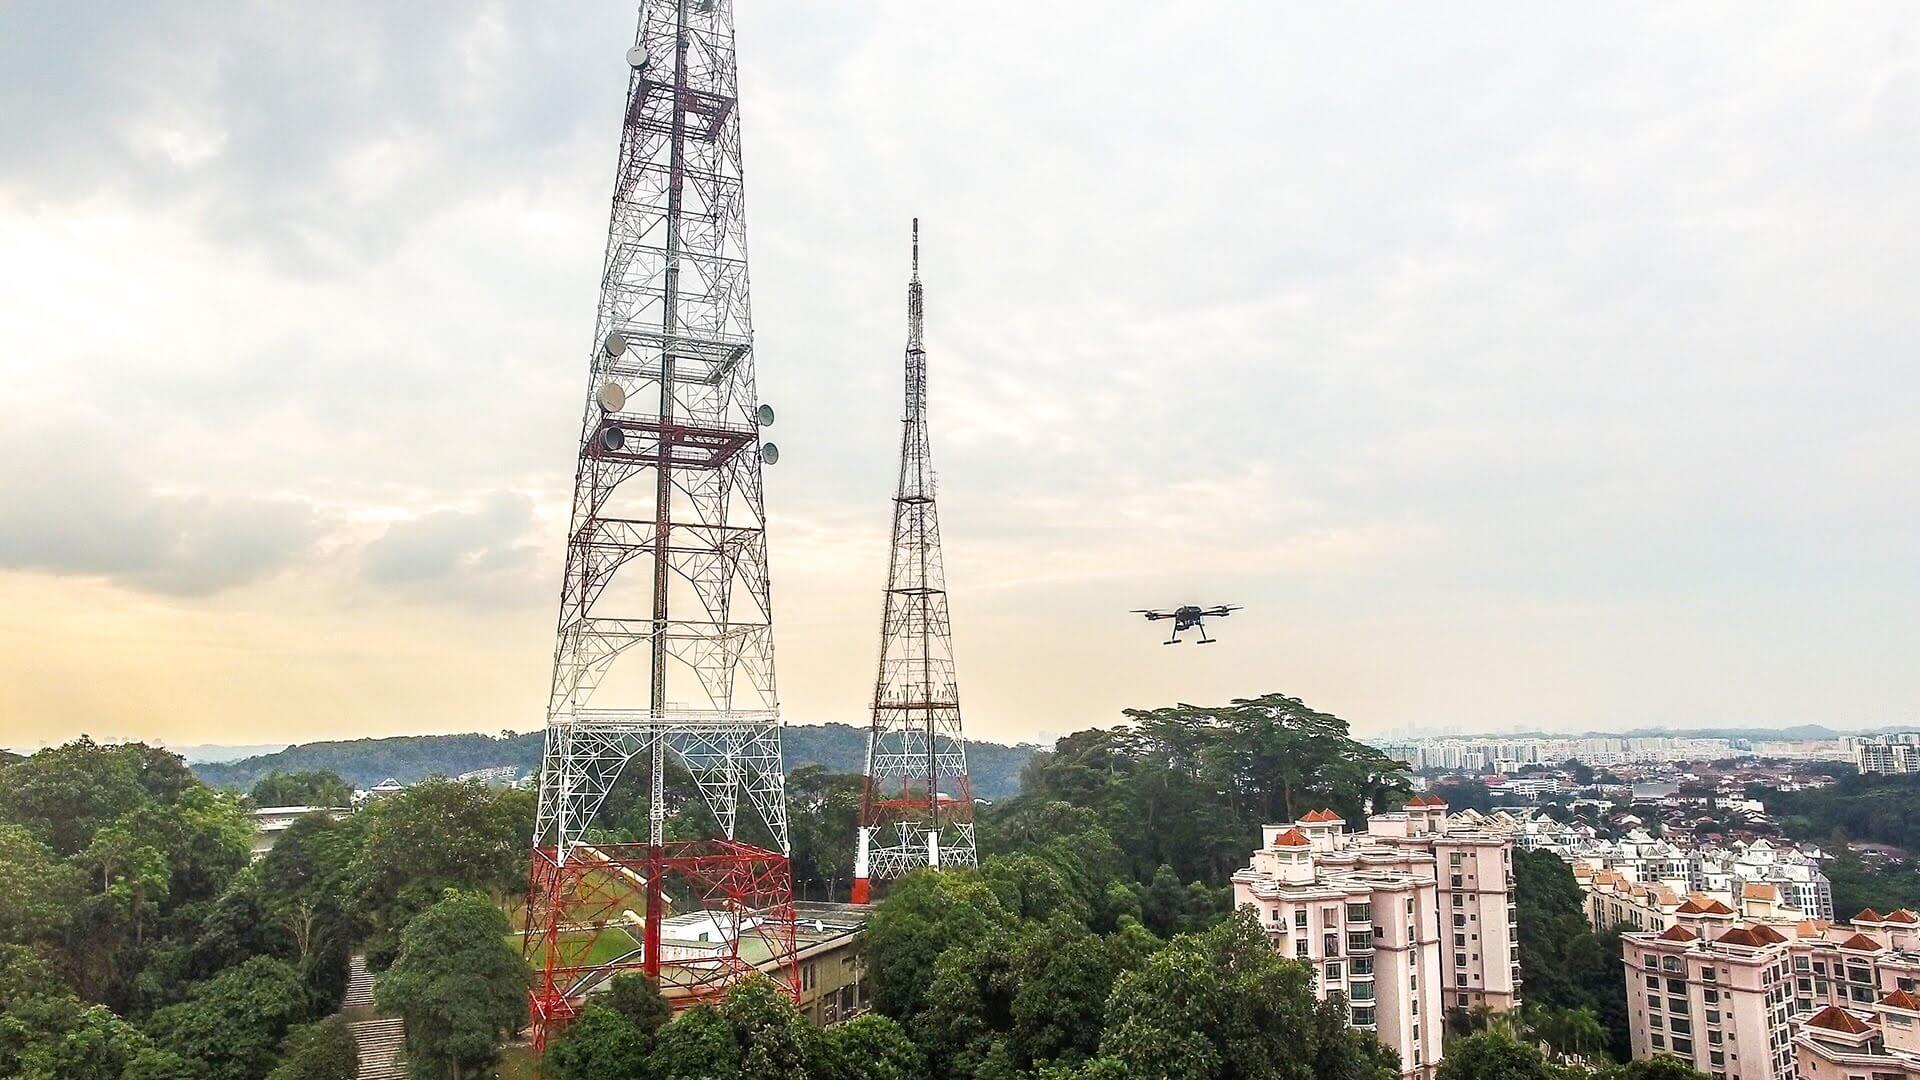 Drones e interferencias magnéticas